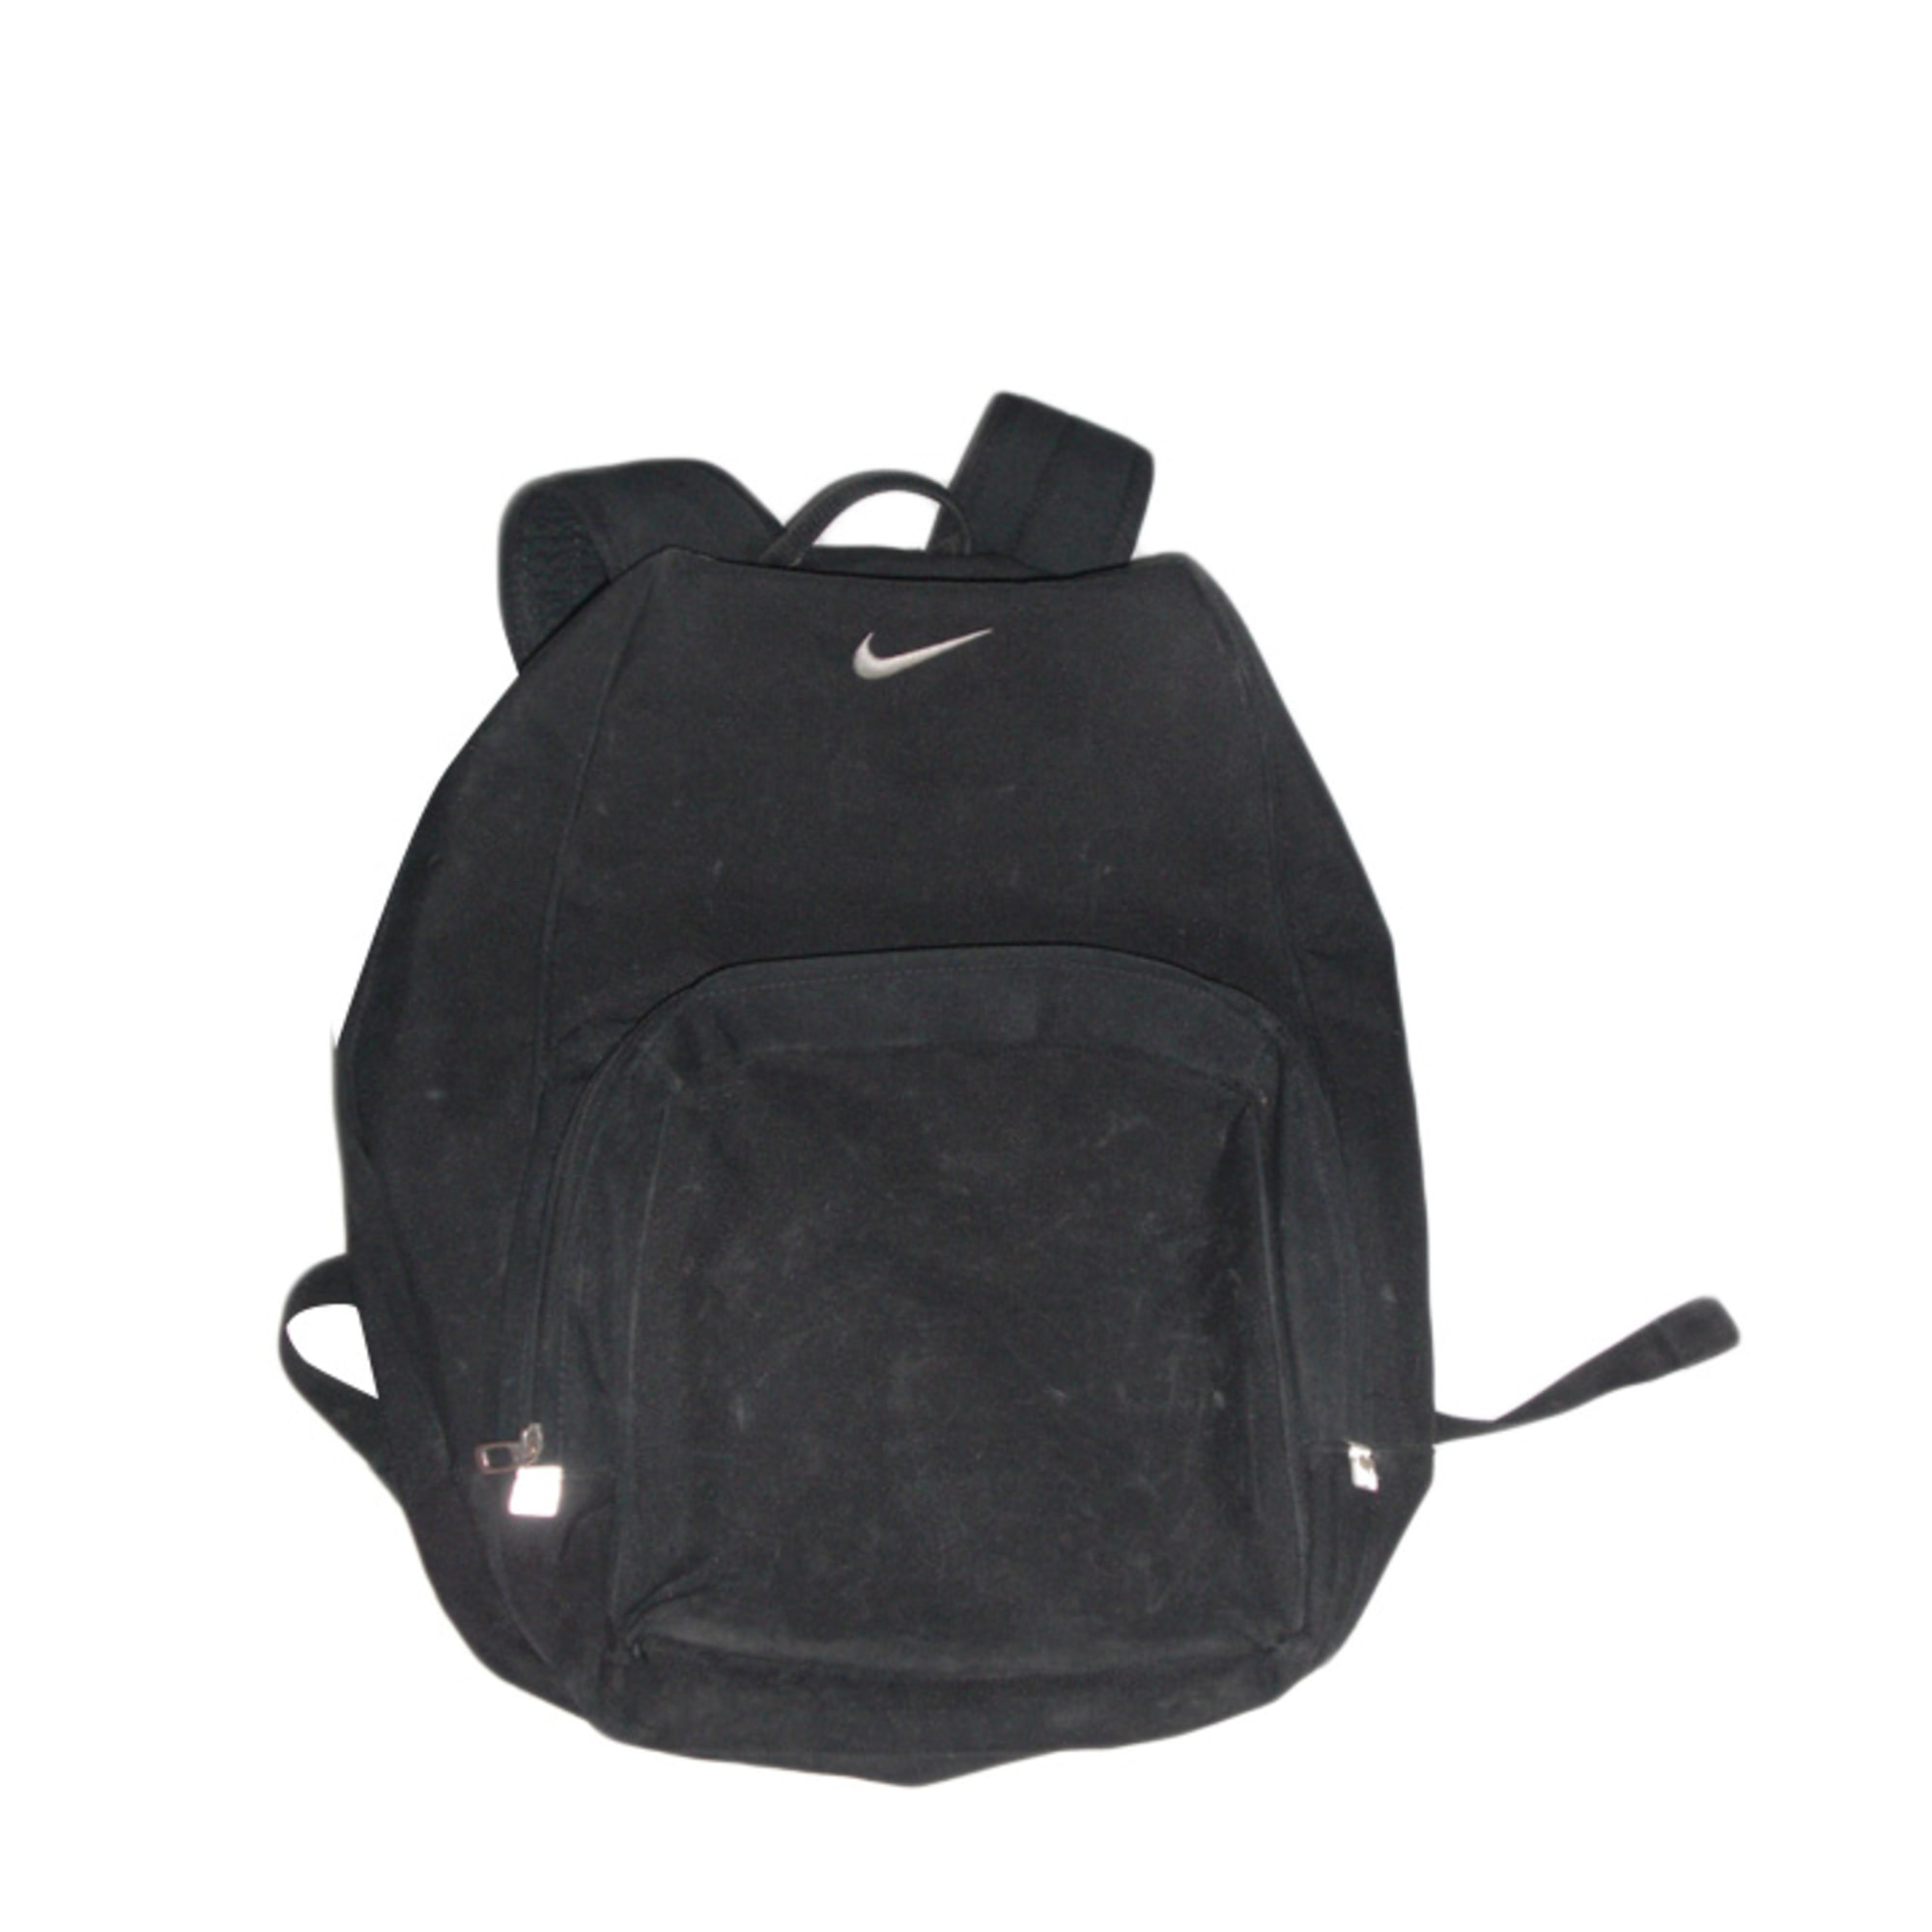 eb1fc7c55d Sac à dos, cartable NIKE noir - 200341